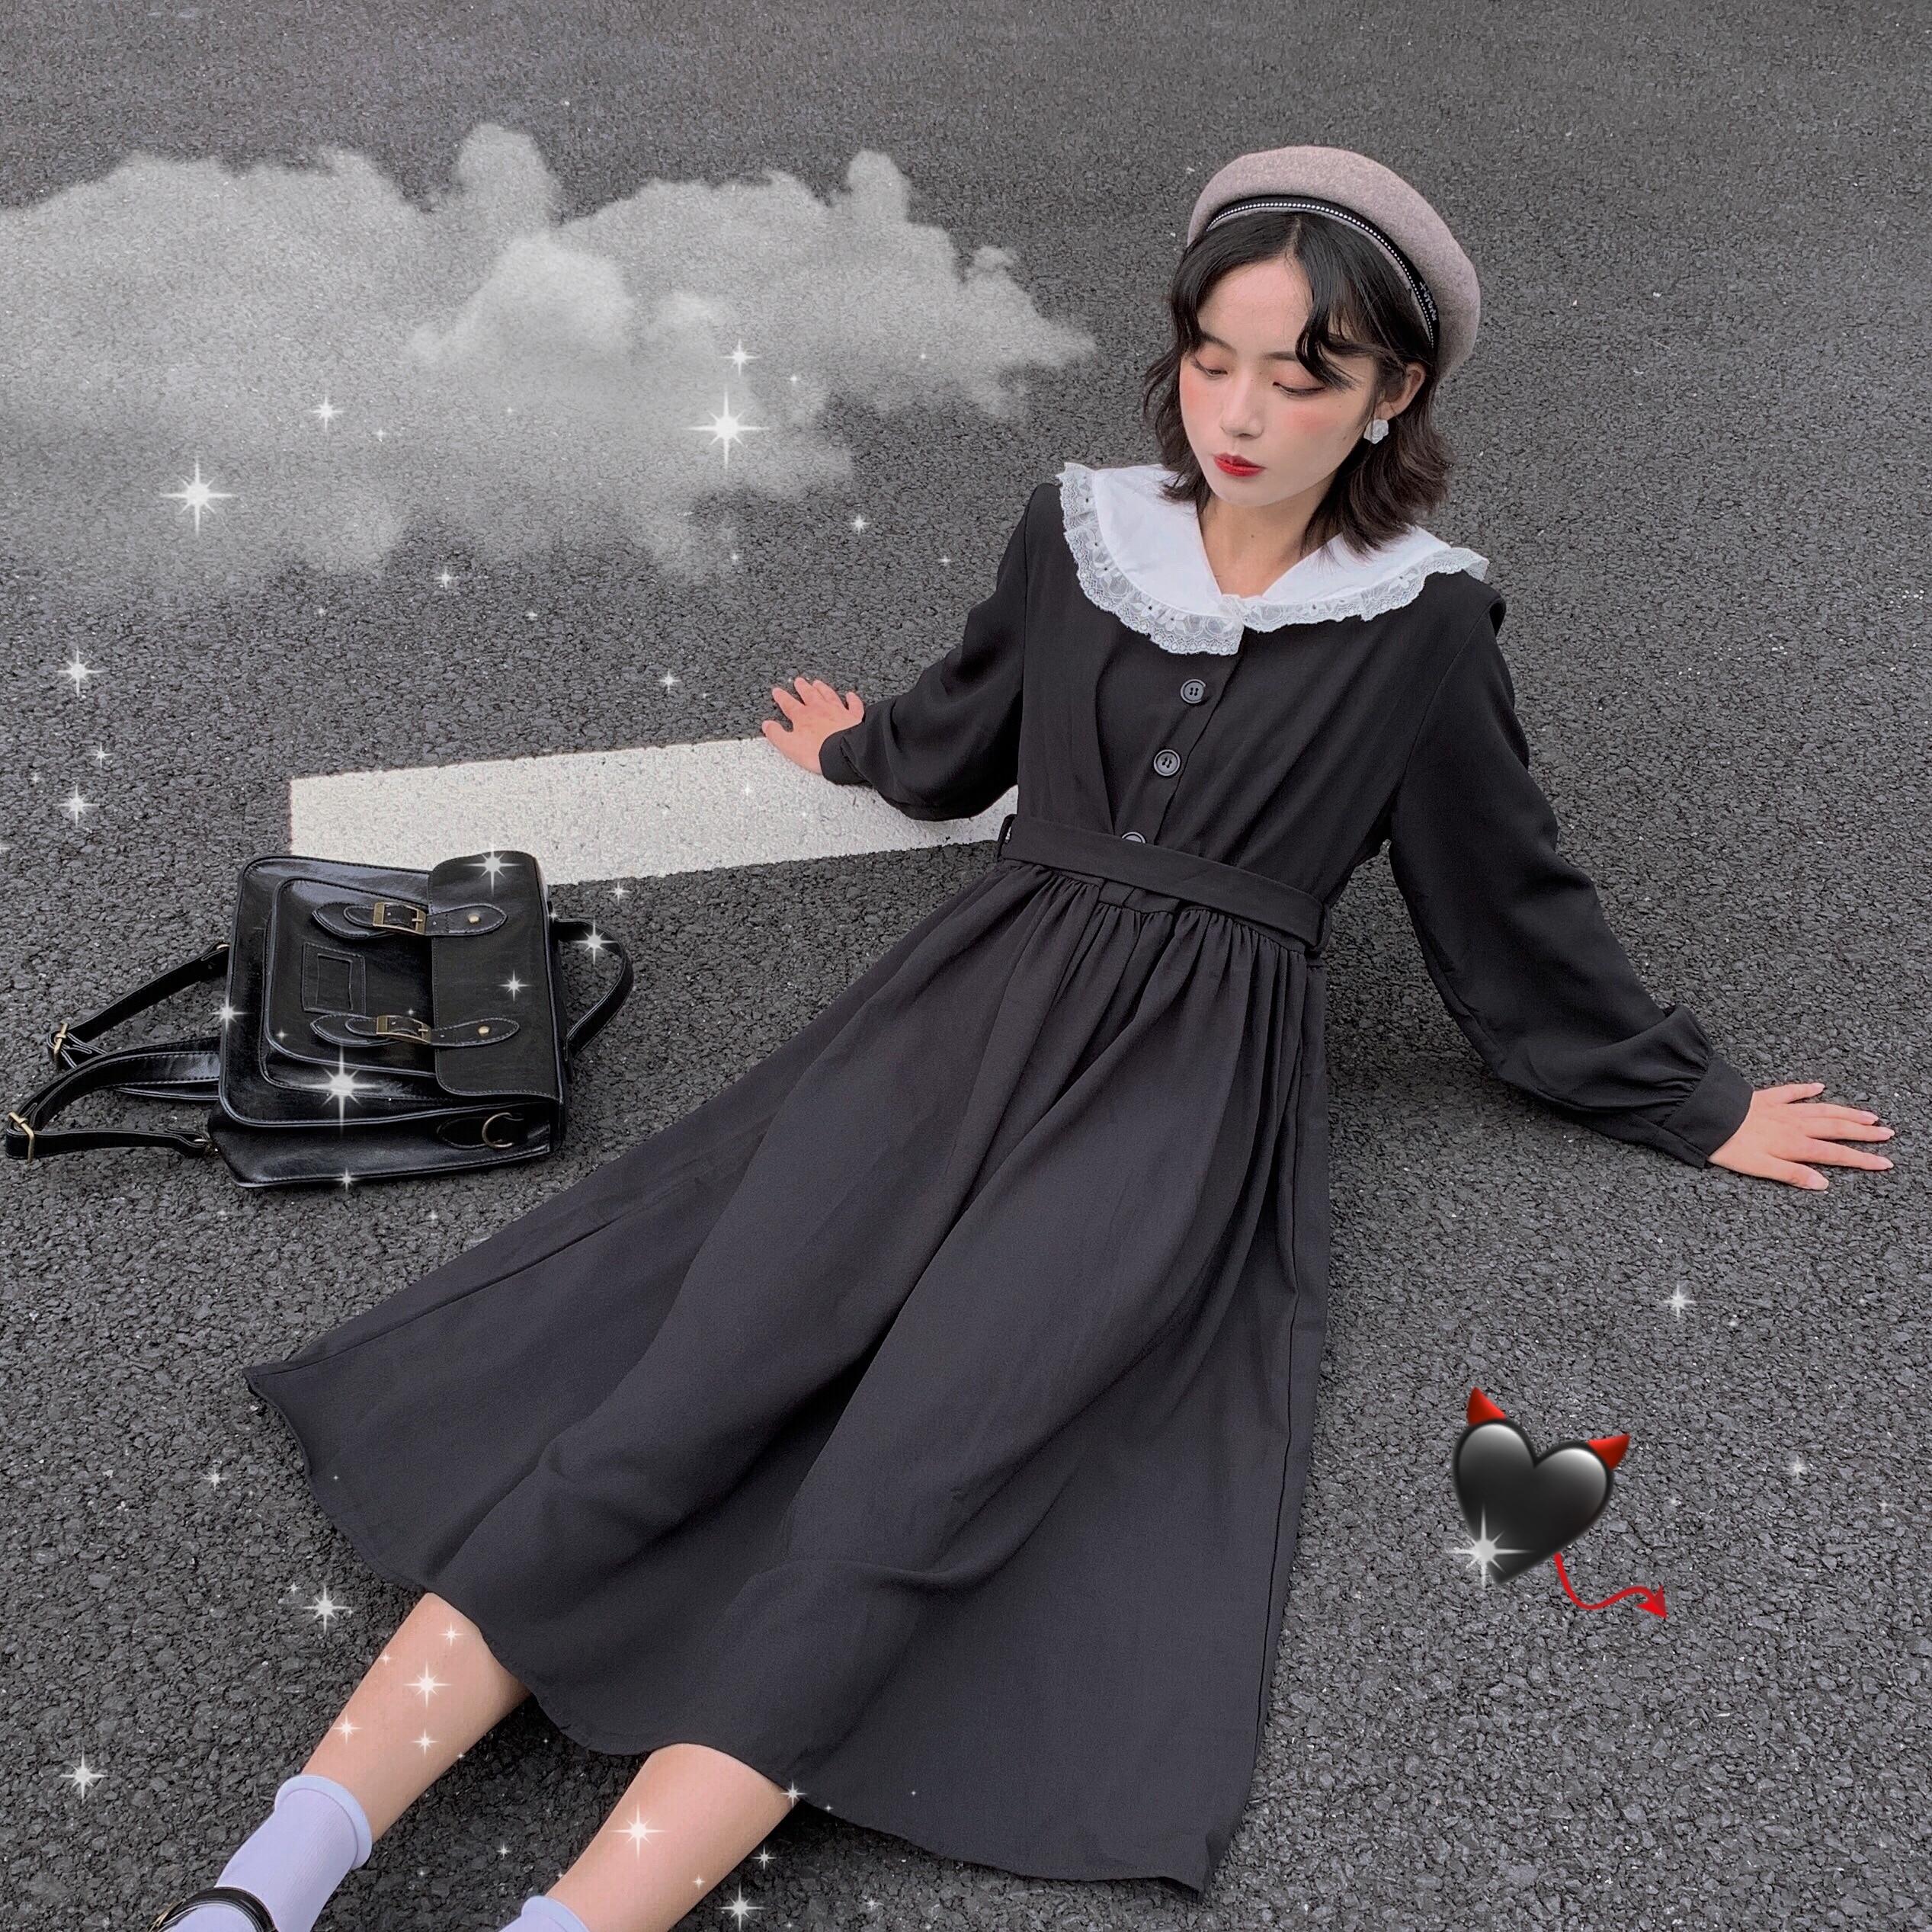 Harajuku Gothic Cosplay Black Sailor Dress Women Lolita Girl Style Lace Collar Vintage Bandage Casual Pleated Long Vestidos 2020